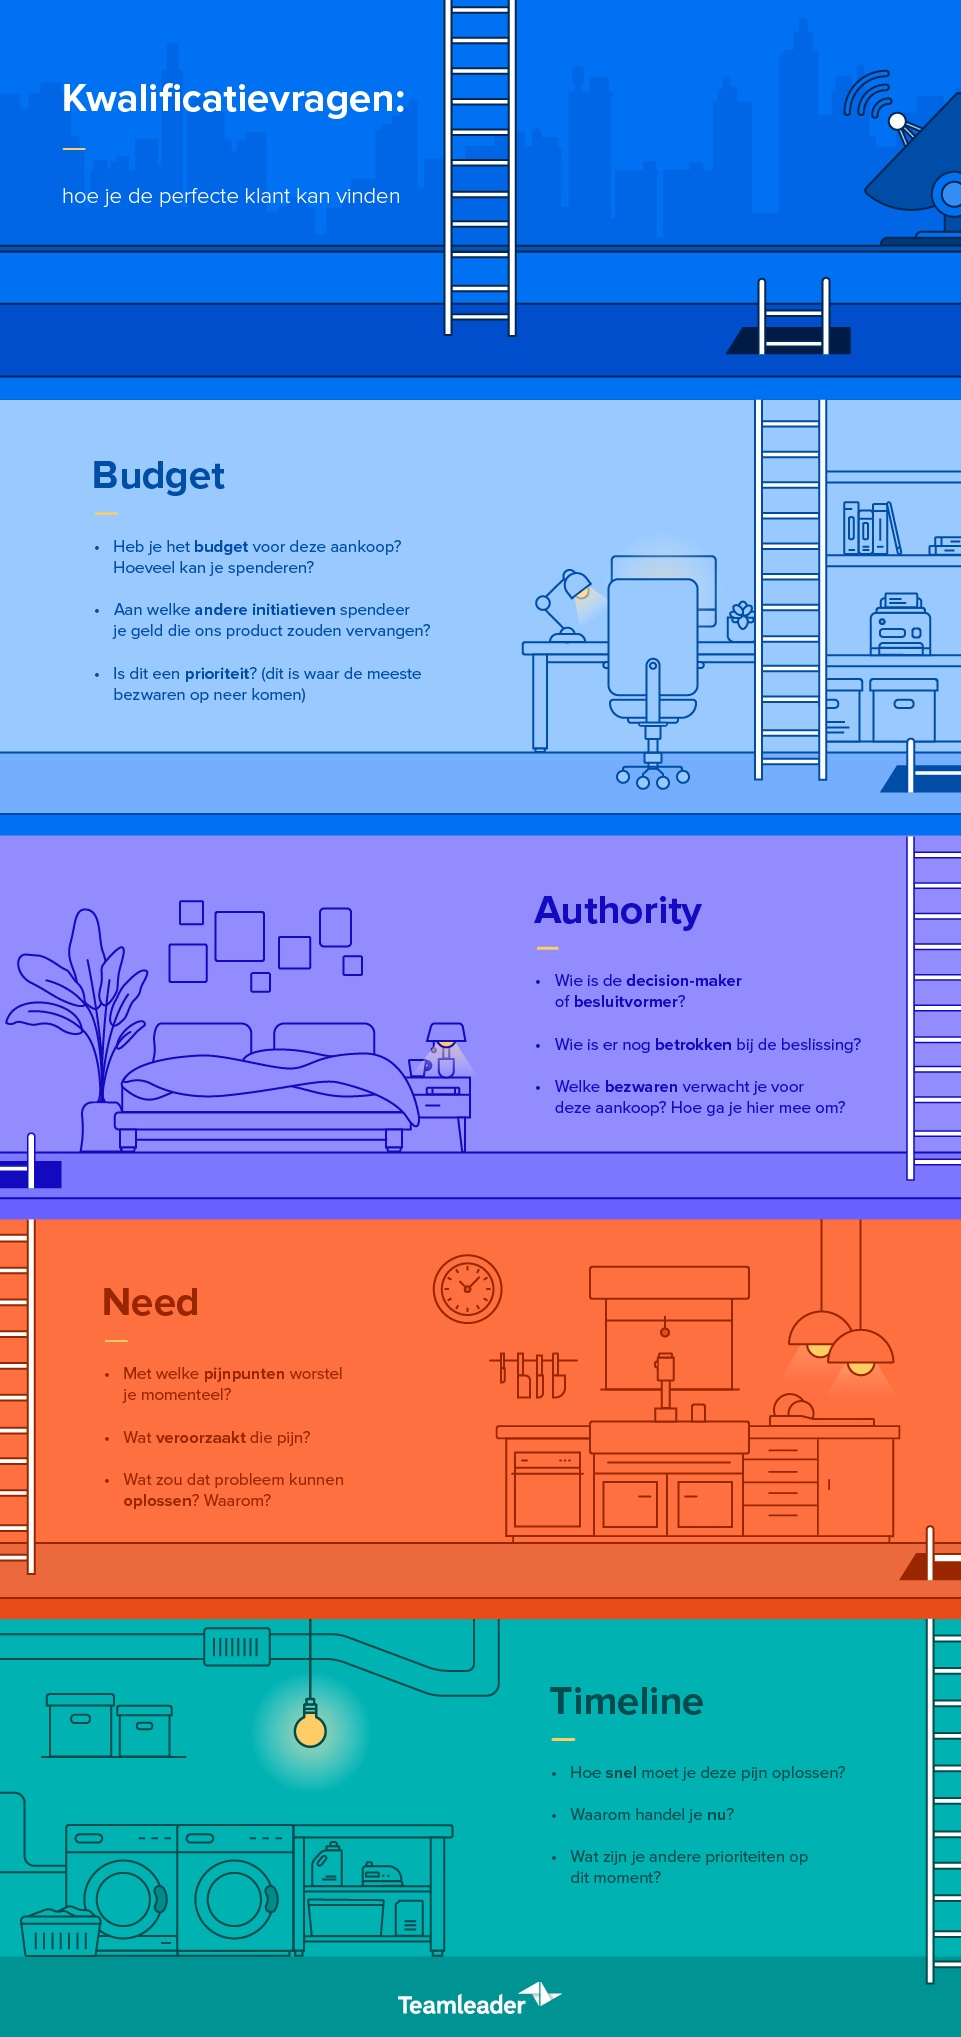 Blog3_QualifyLeads_Infographic_BE-NL.jpg